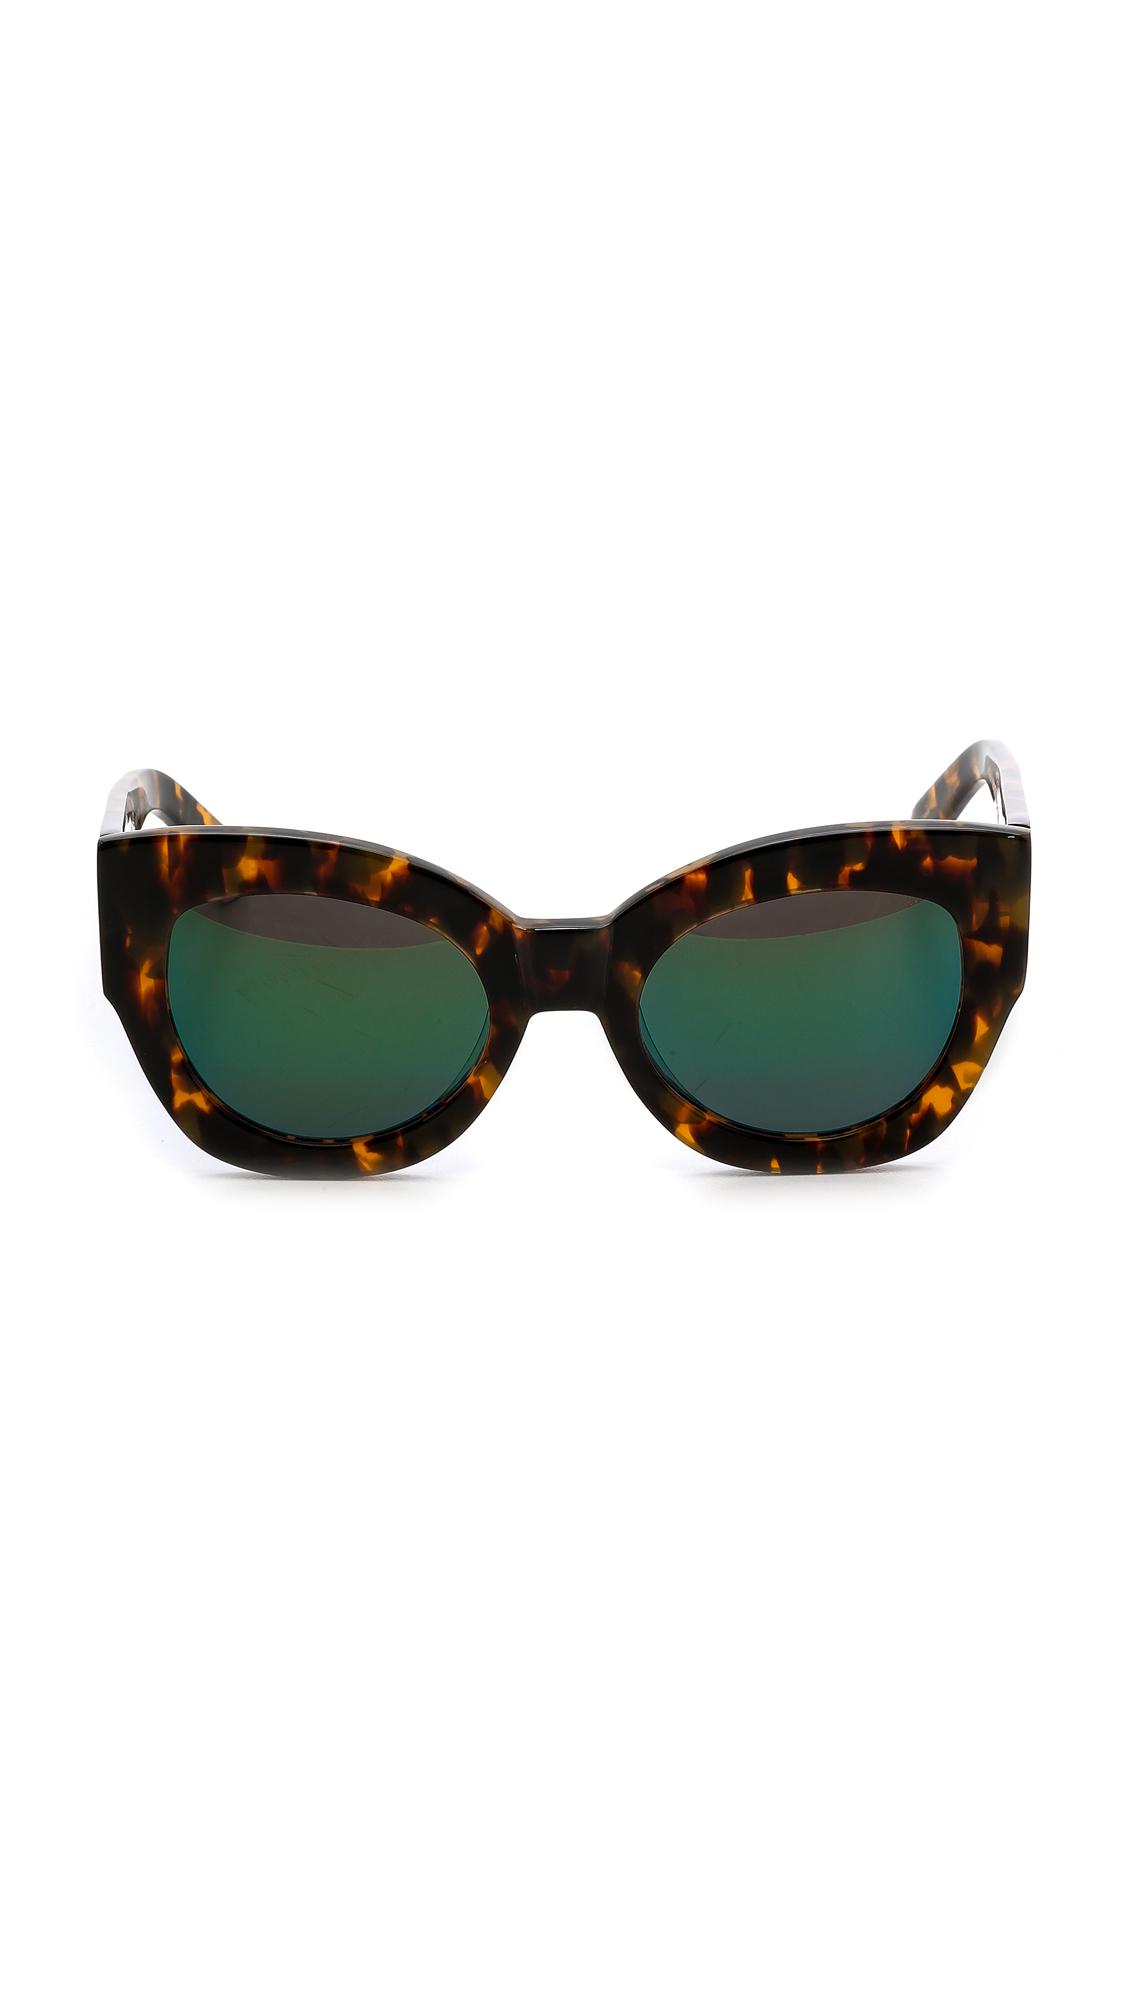 Karen Walker Mirrored Sunglasses  karen walker superstars collection northern lights mirrored